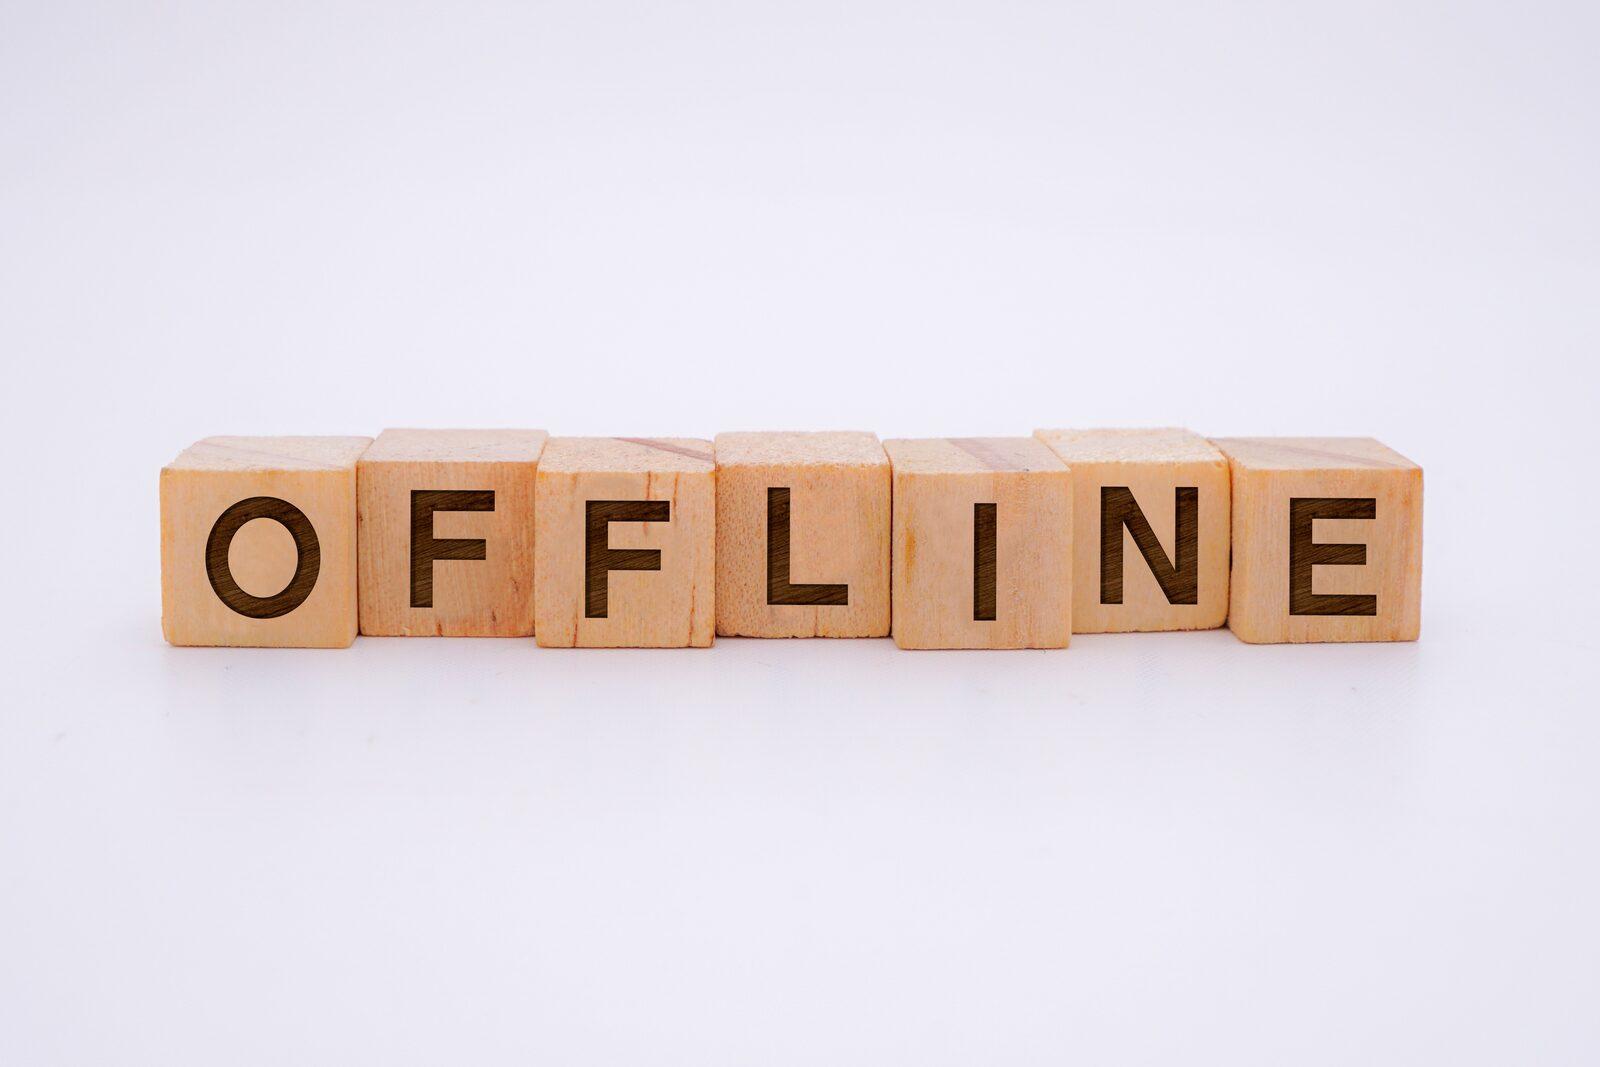 Offline blokken letters